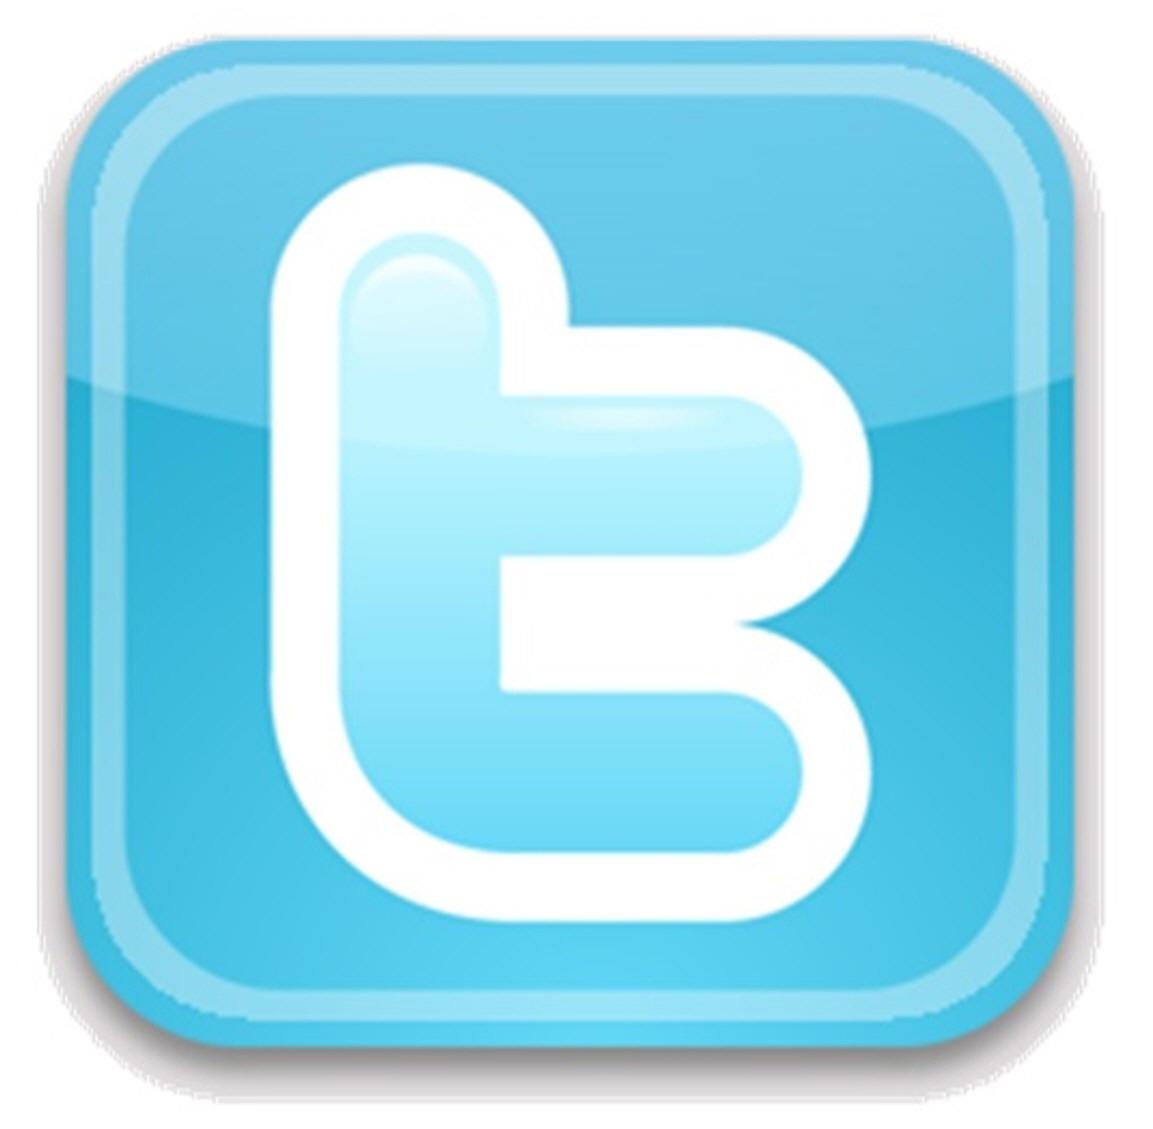 Pepe Rosa su Twitter